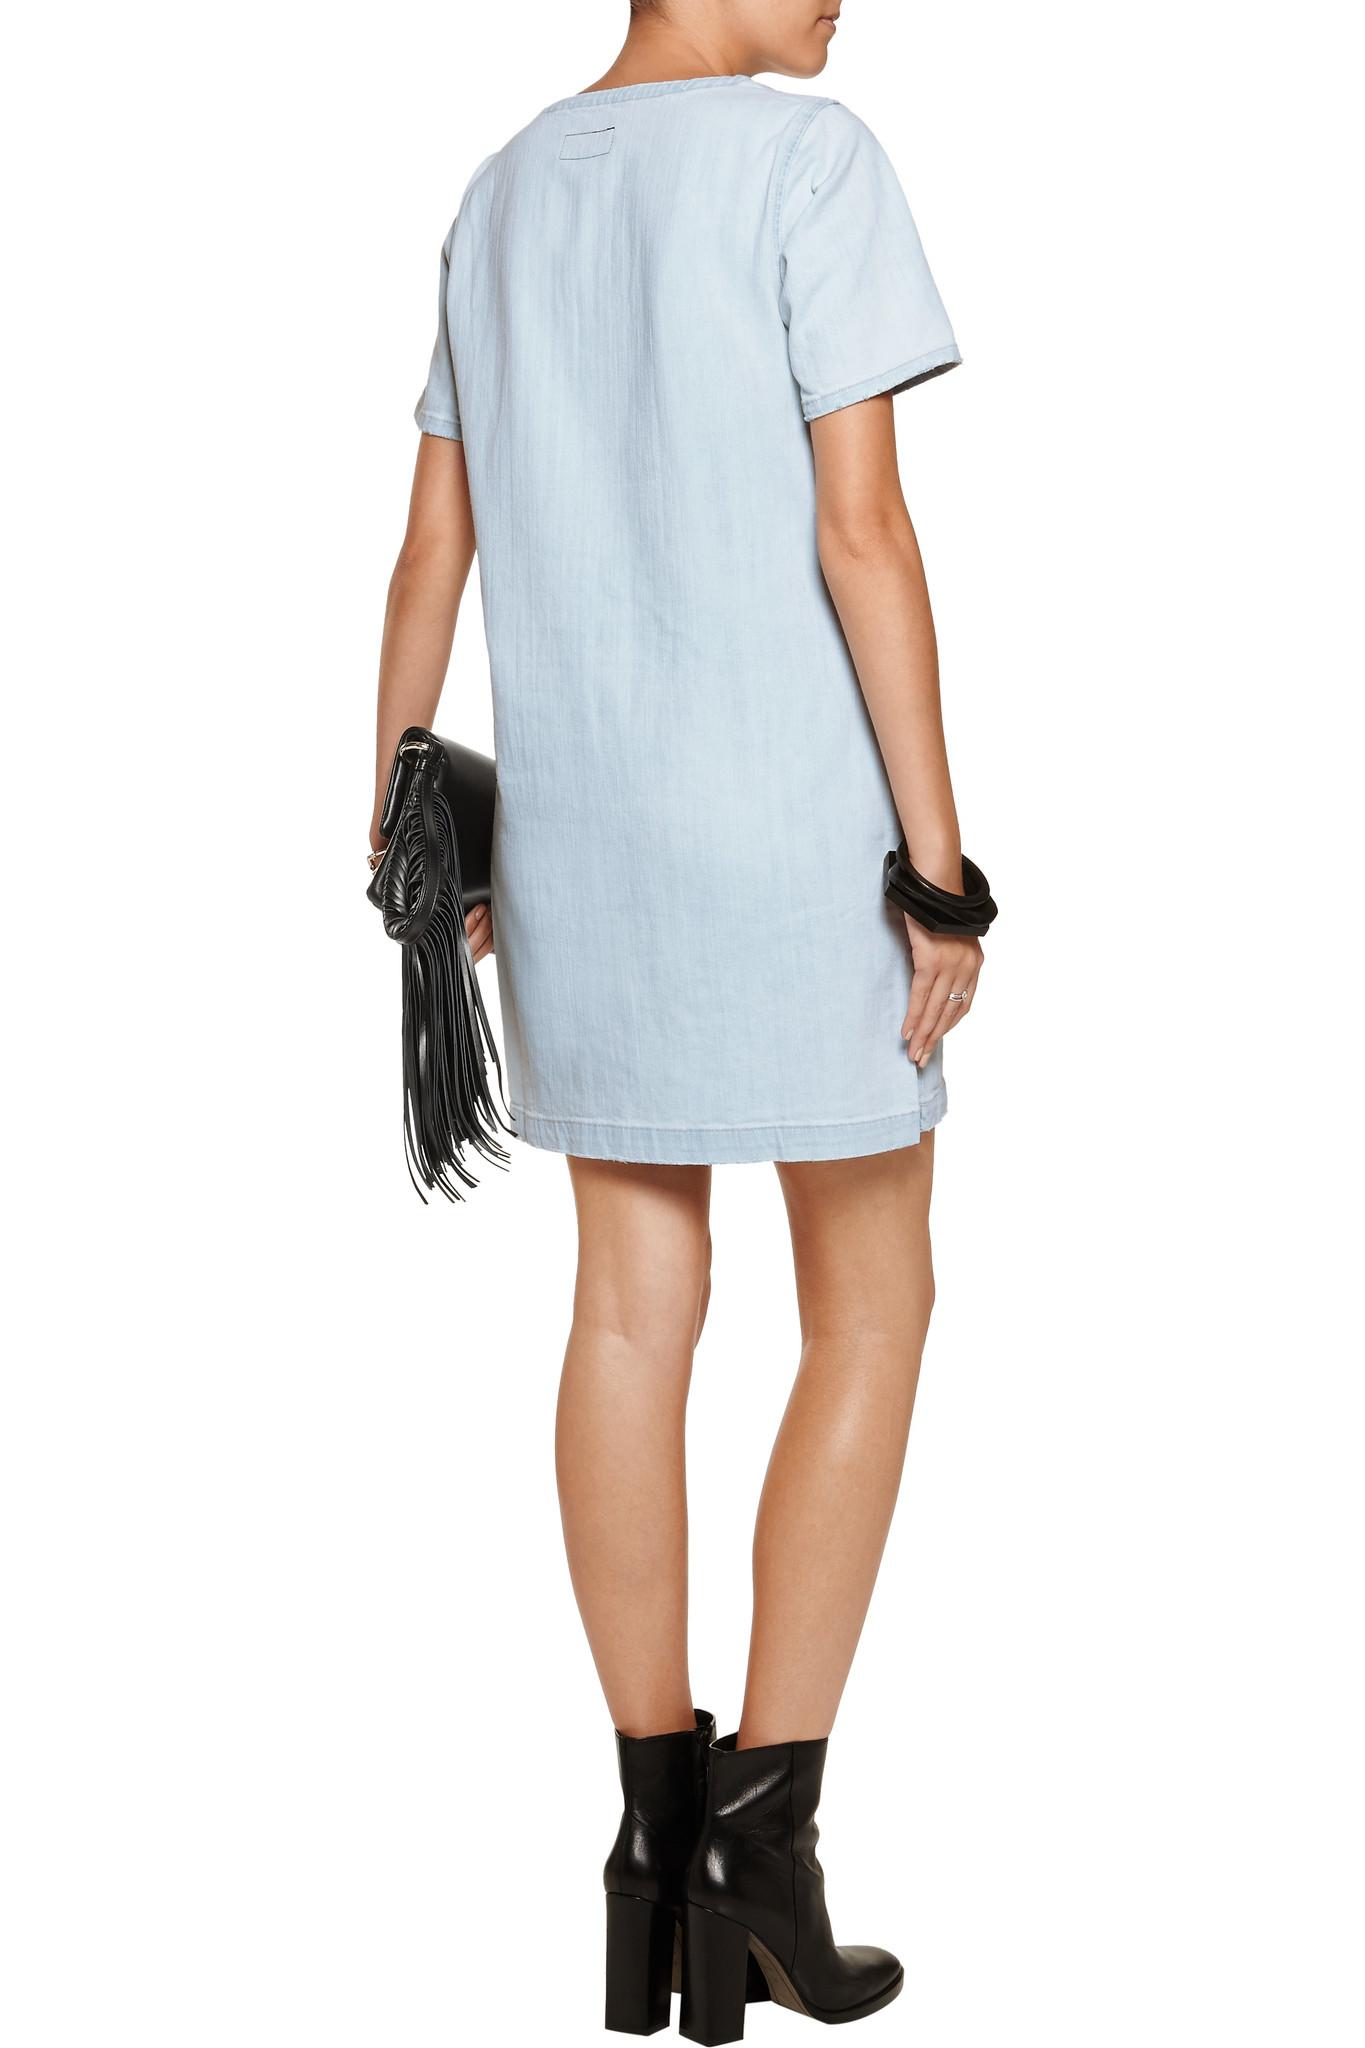 Current Elliott Denim Mini Dress in Blue - Lyst 4c6c467fd